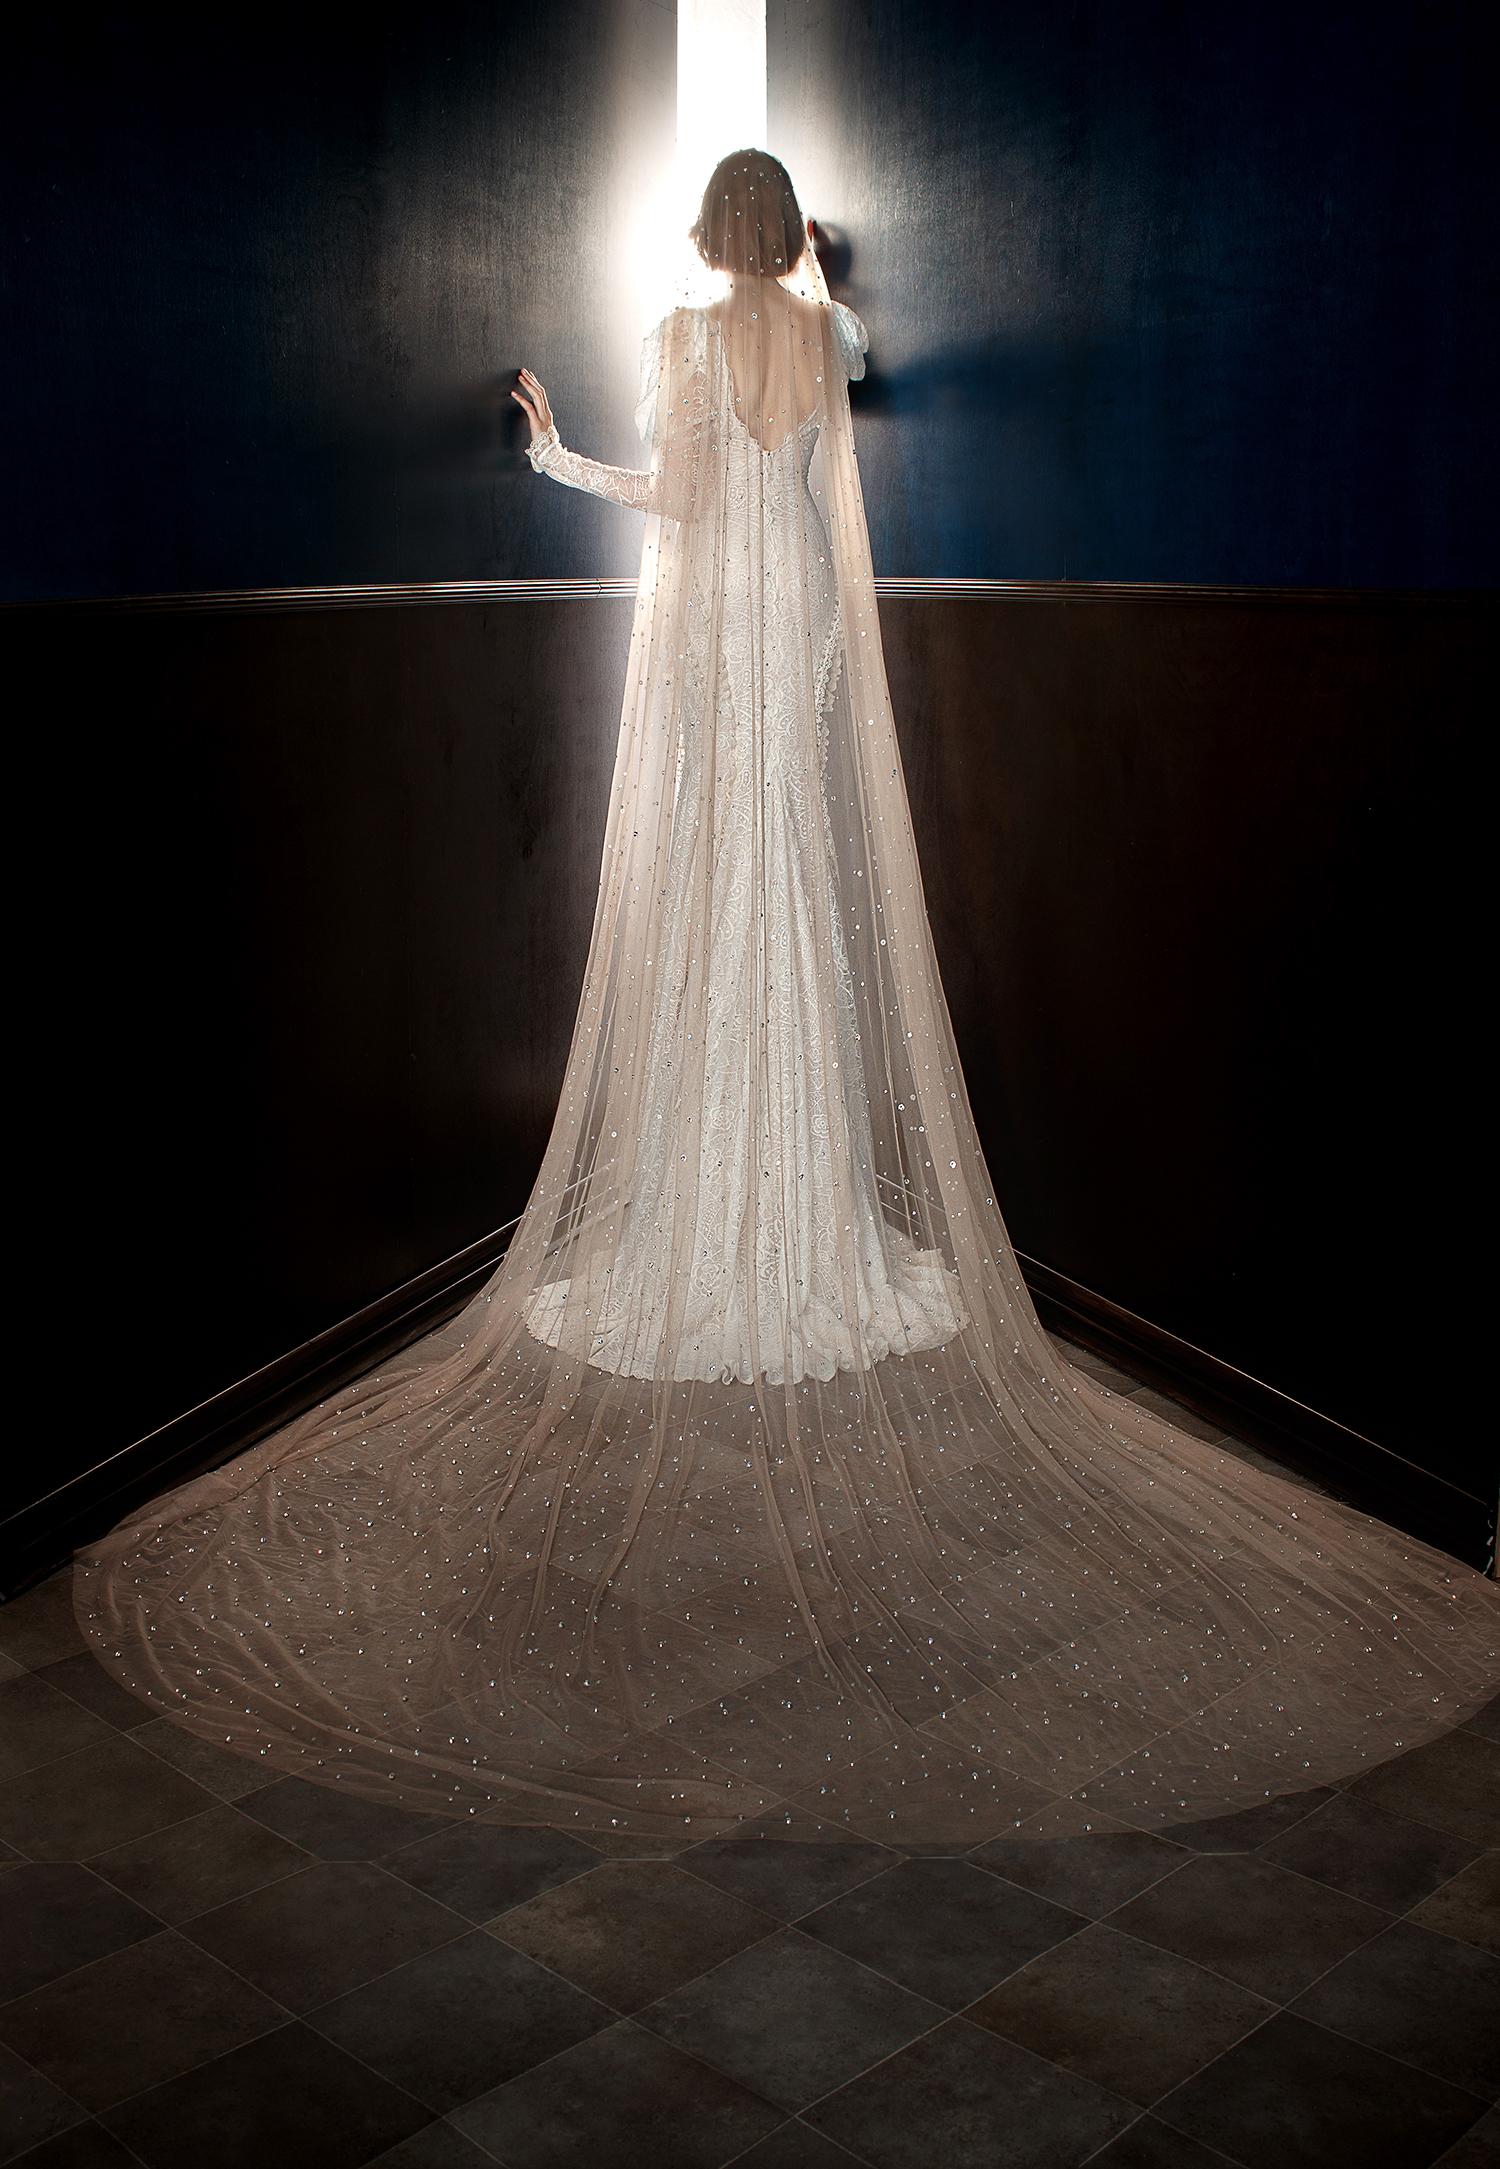 galia lahav wedding dress spring 2018 long sleeves veil shimmer